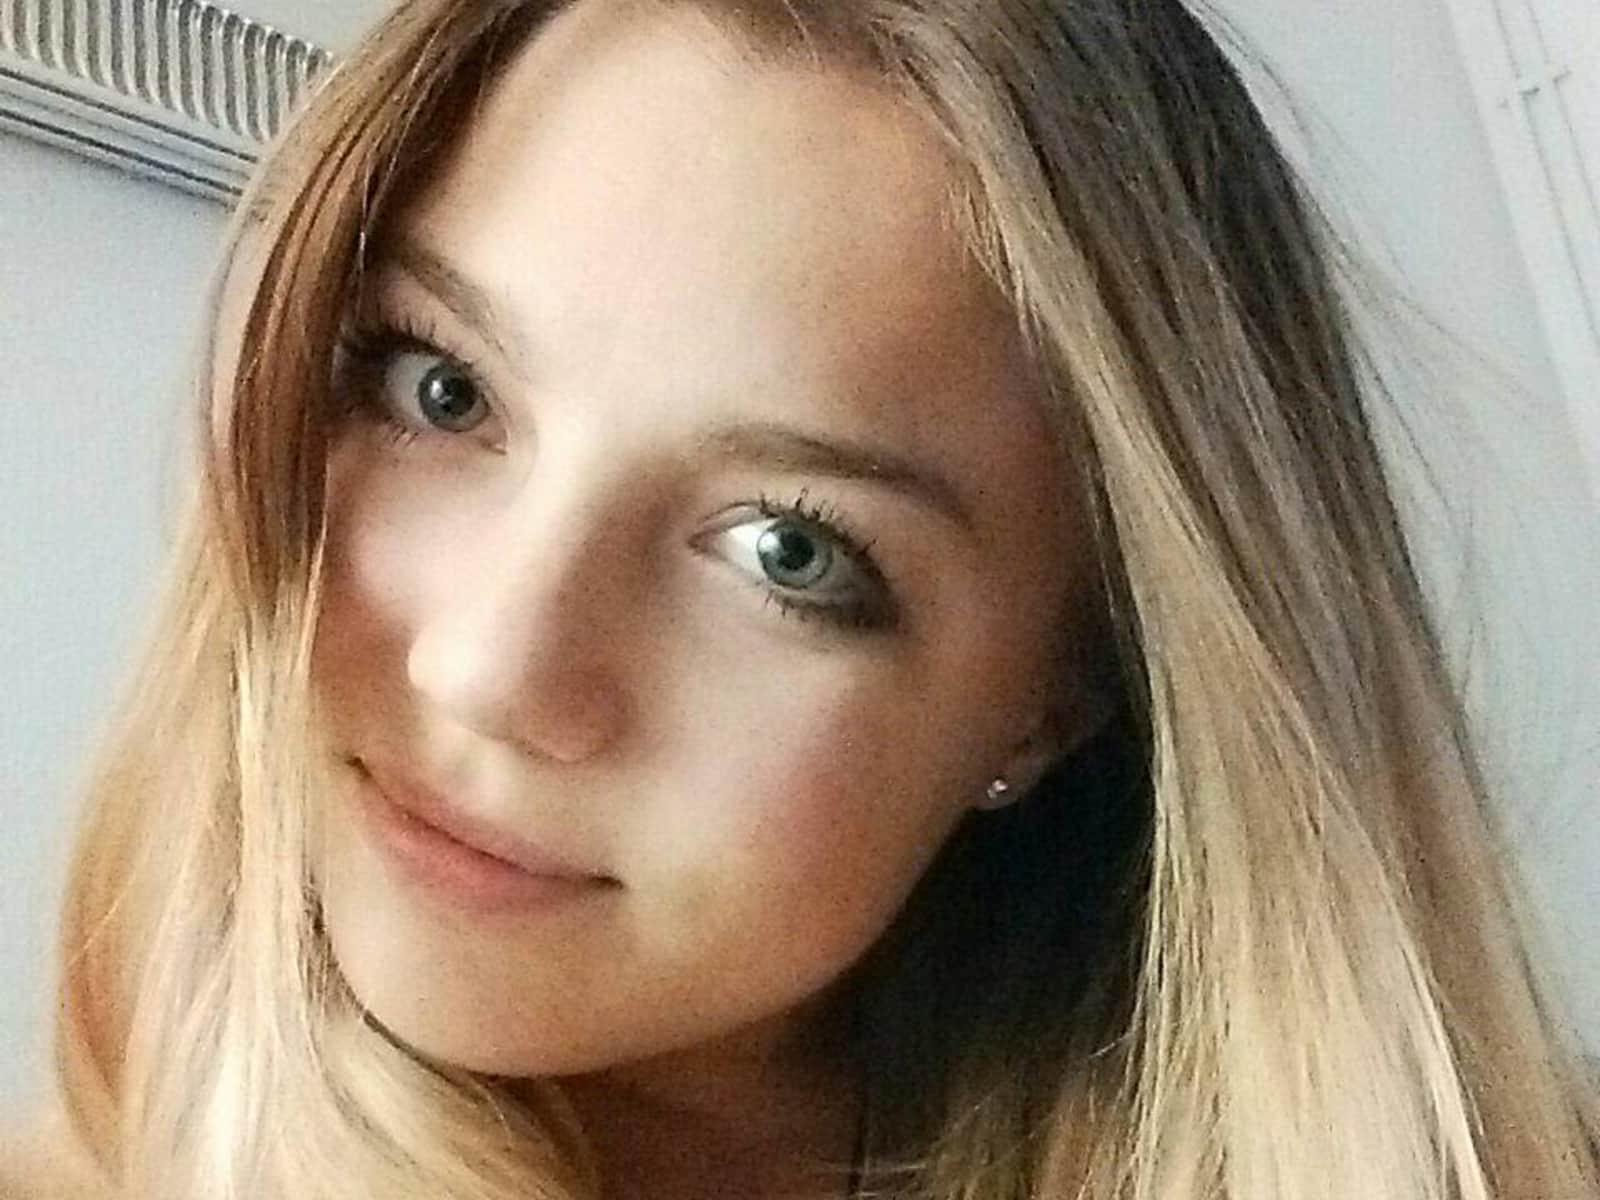 Anastasia from Barcelona, Spain